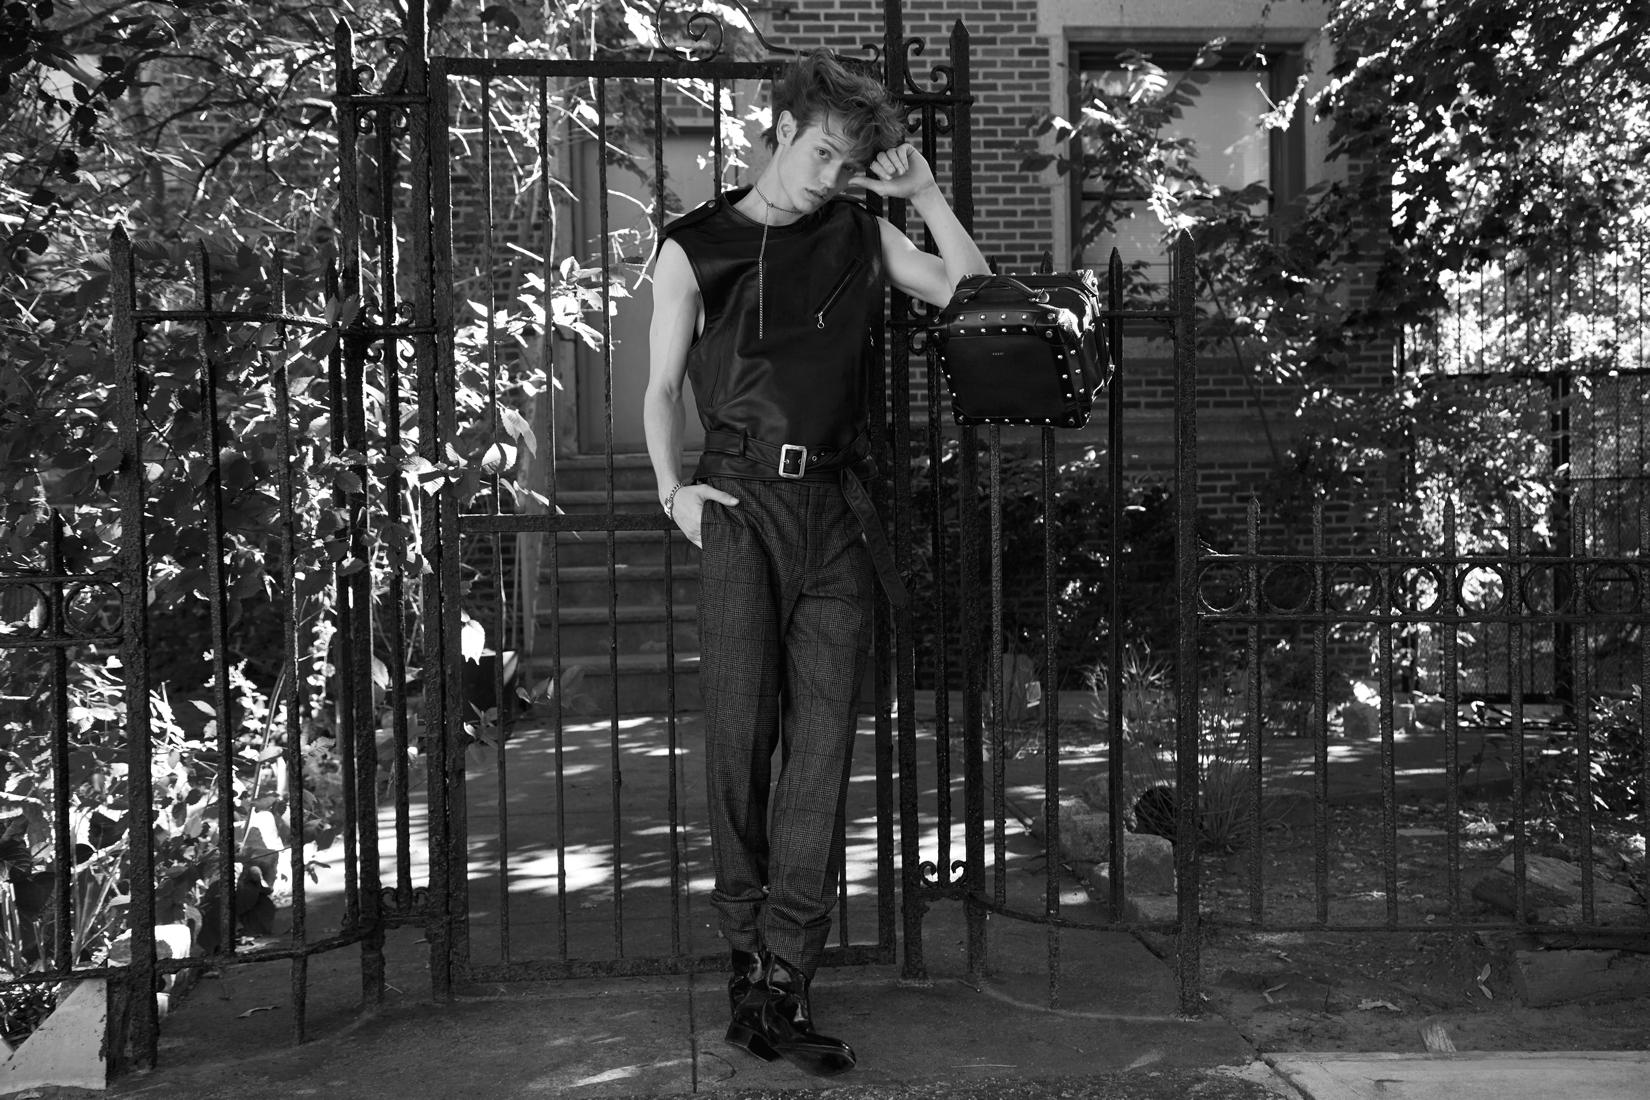 vest : HYKE pants: OFFICINE GENERALE  shoes : ROBERTO CAVALLI bag: SACAI  necklace : MARLAND BACKUS DESIGN